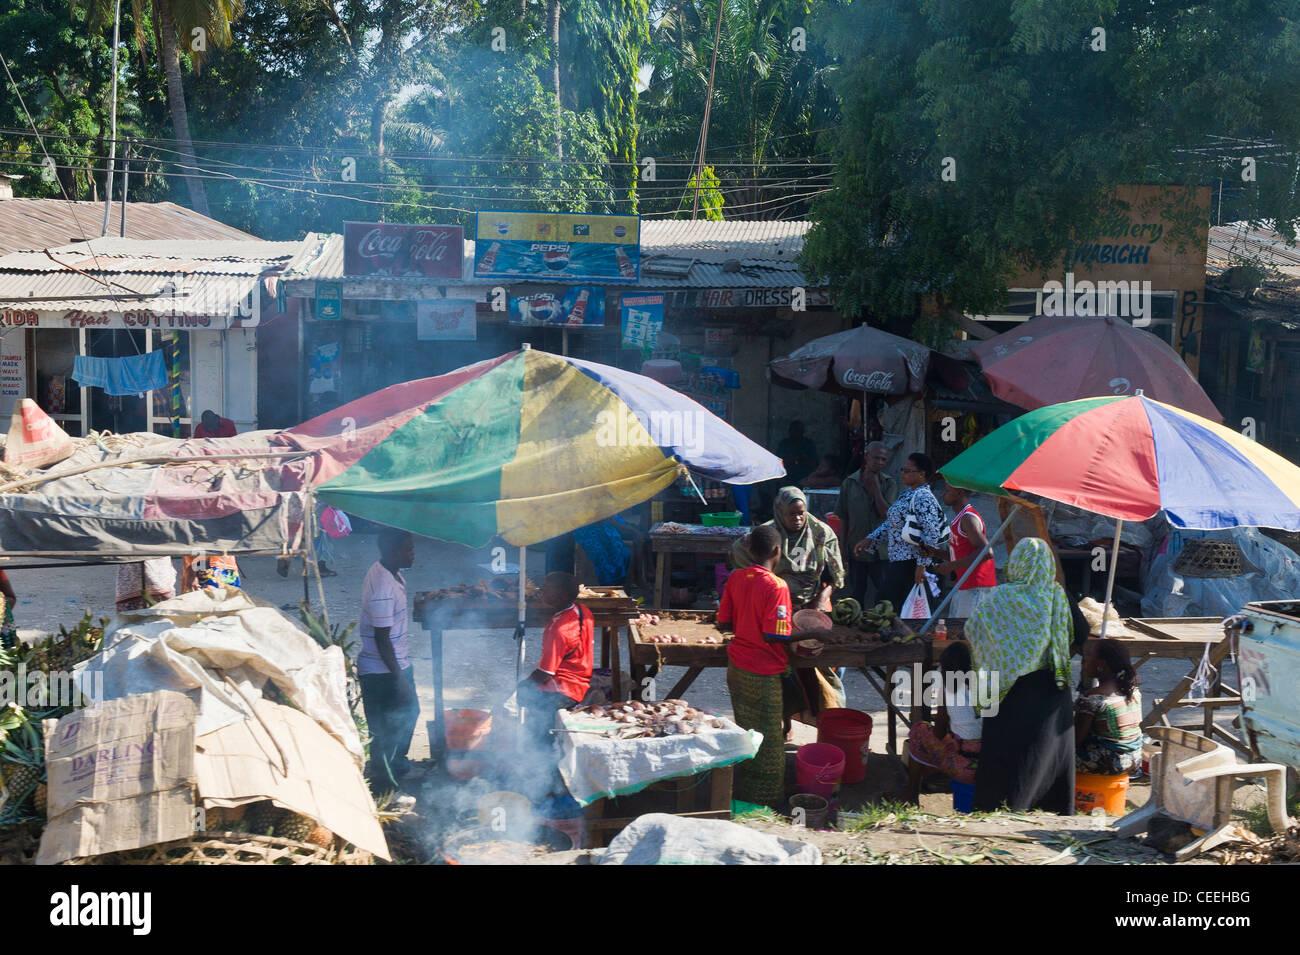 Market stands along a road in Dar es Salaam Tanzania - Stock Image